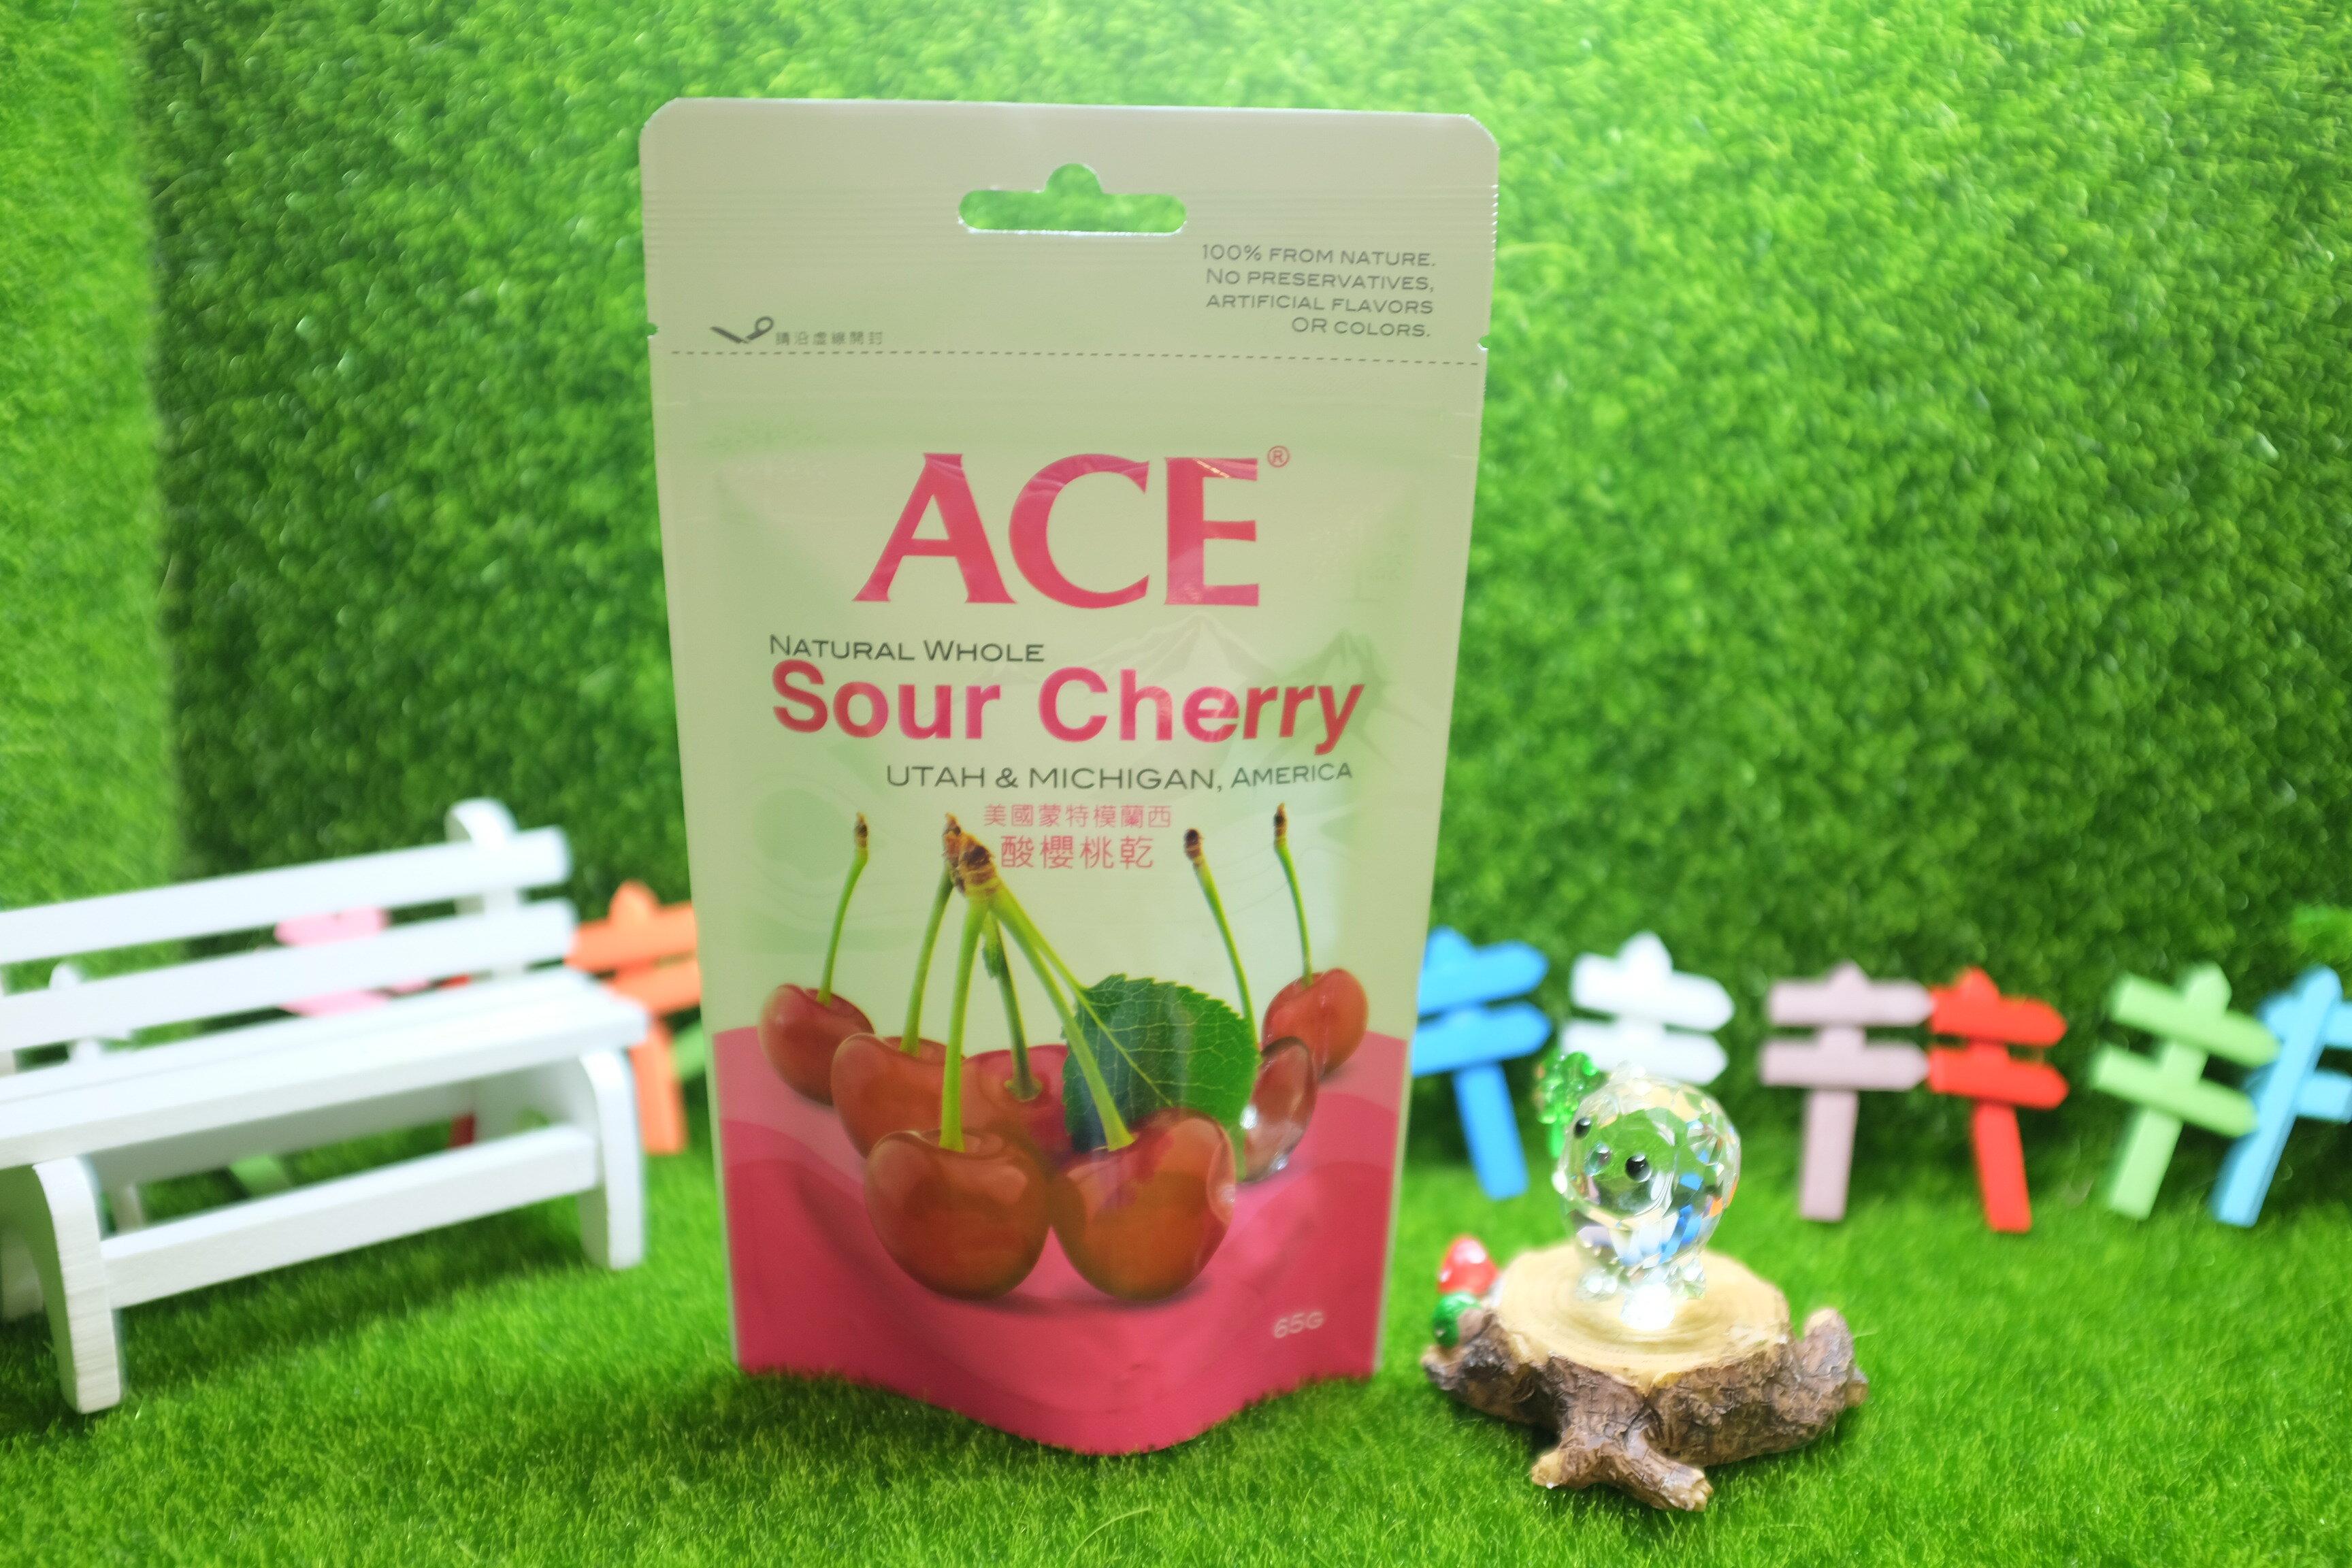 ACE 酸櫻桃乾 65g#美國蒙特模蘭西 sour cherry